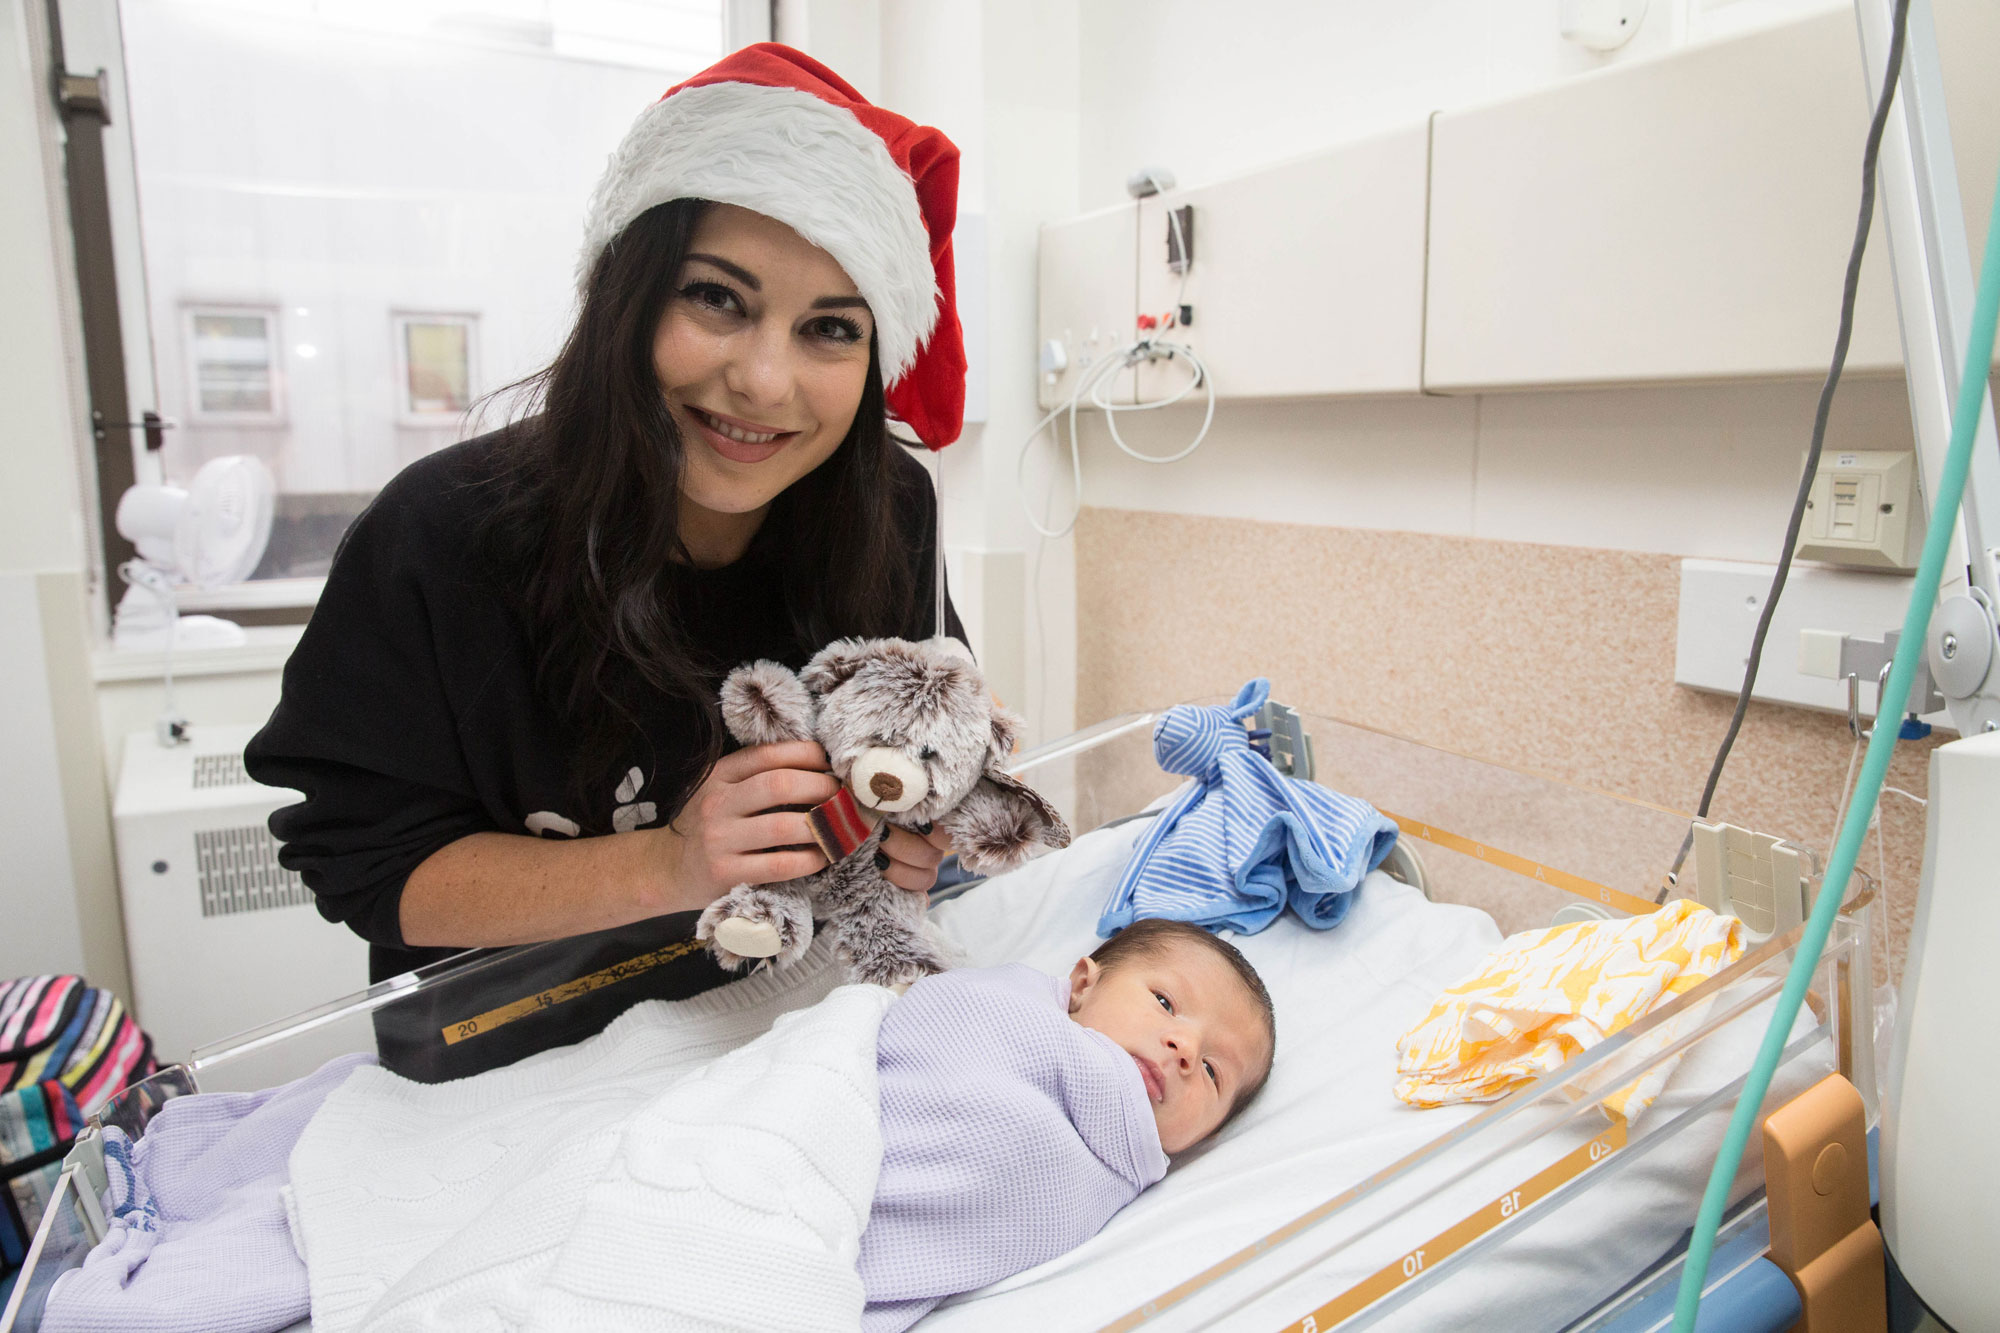 Made In Chelsea Stars Christmas Ward Visit at Royal Brompton Hospital